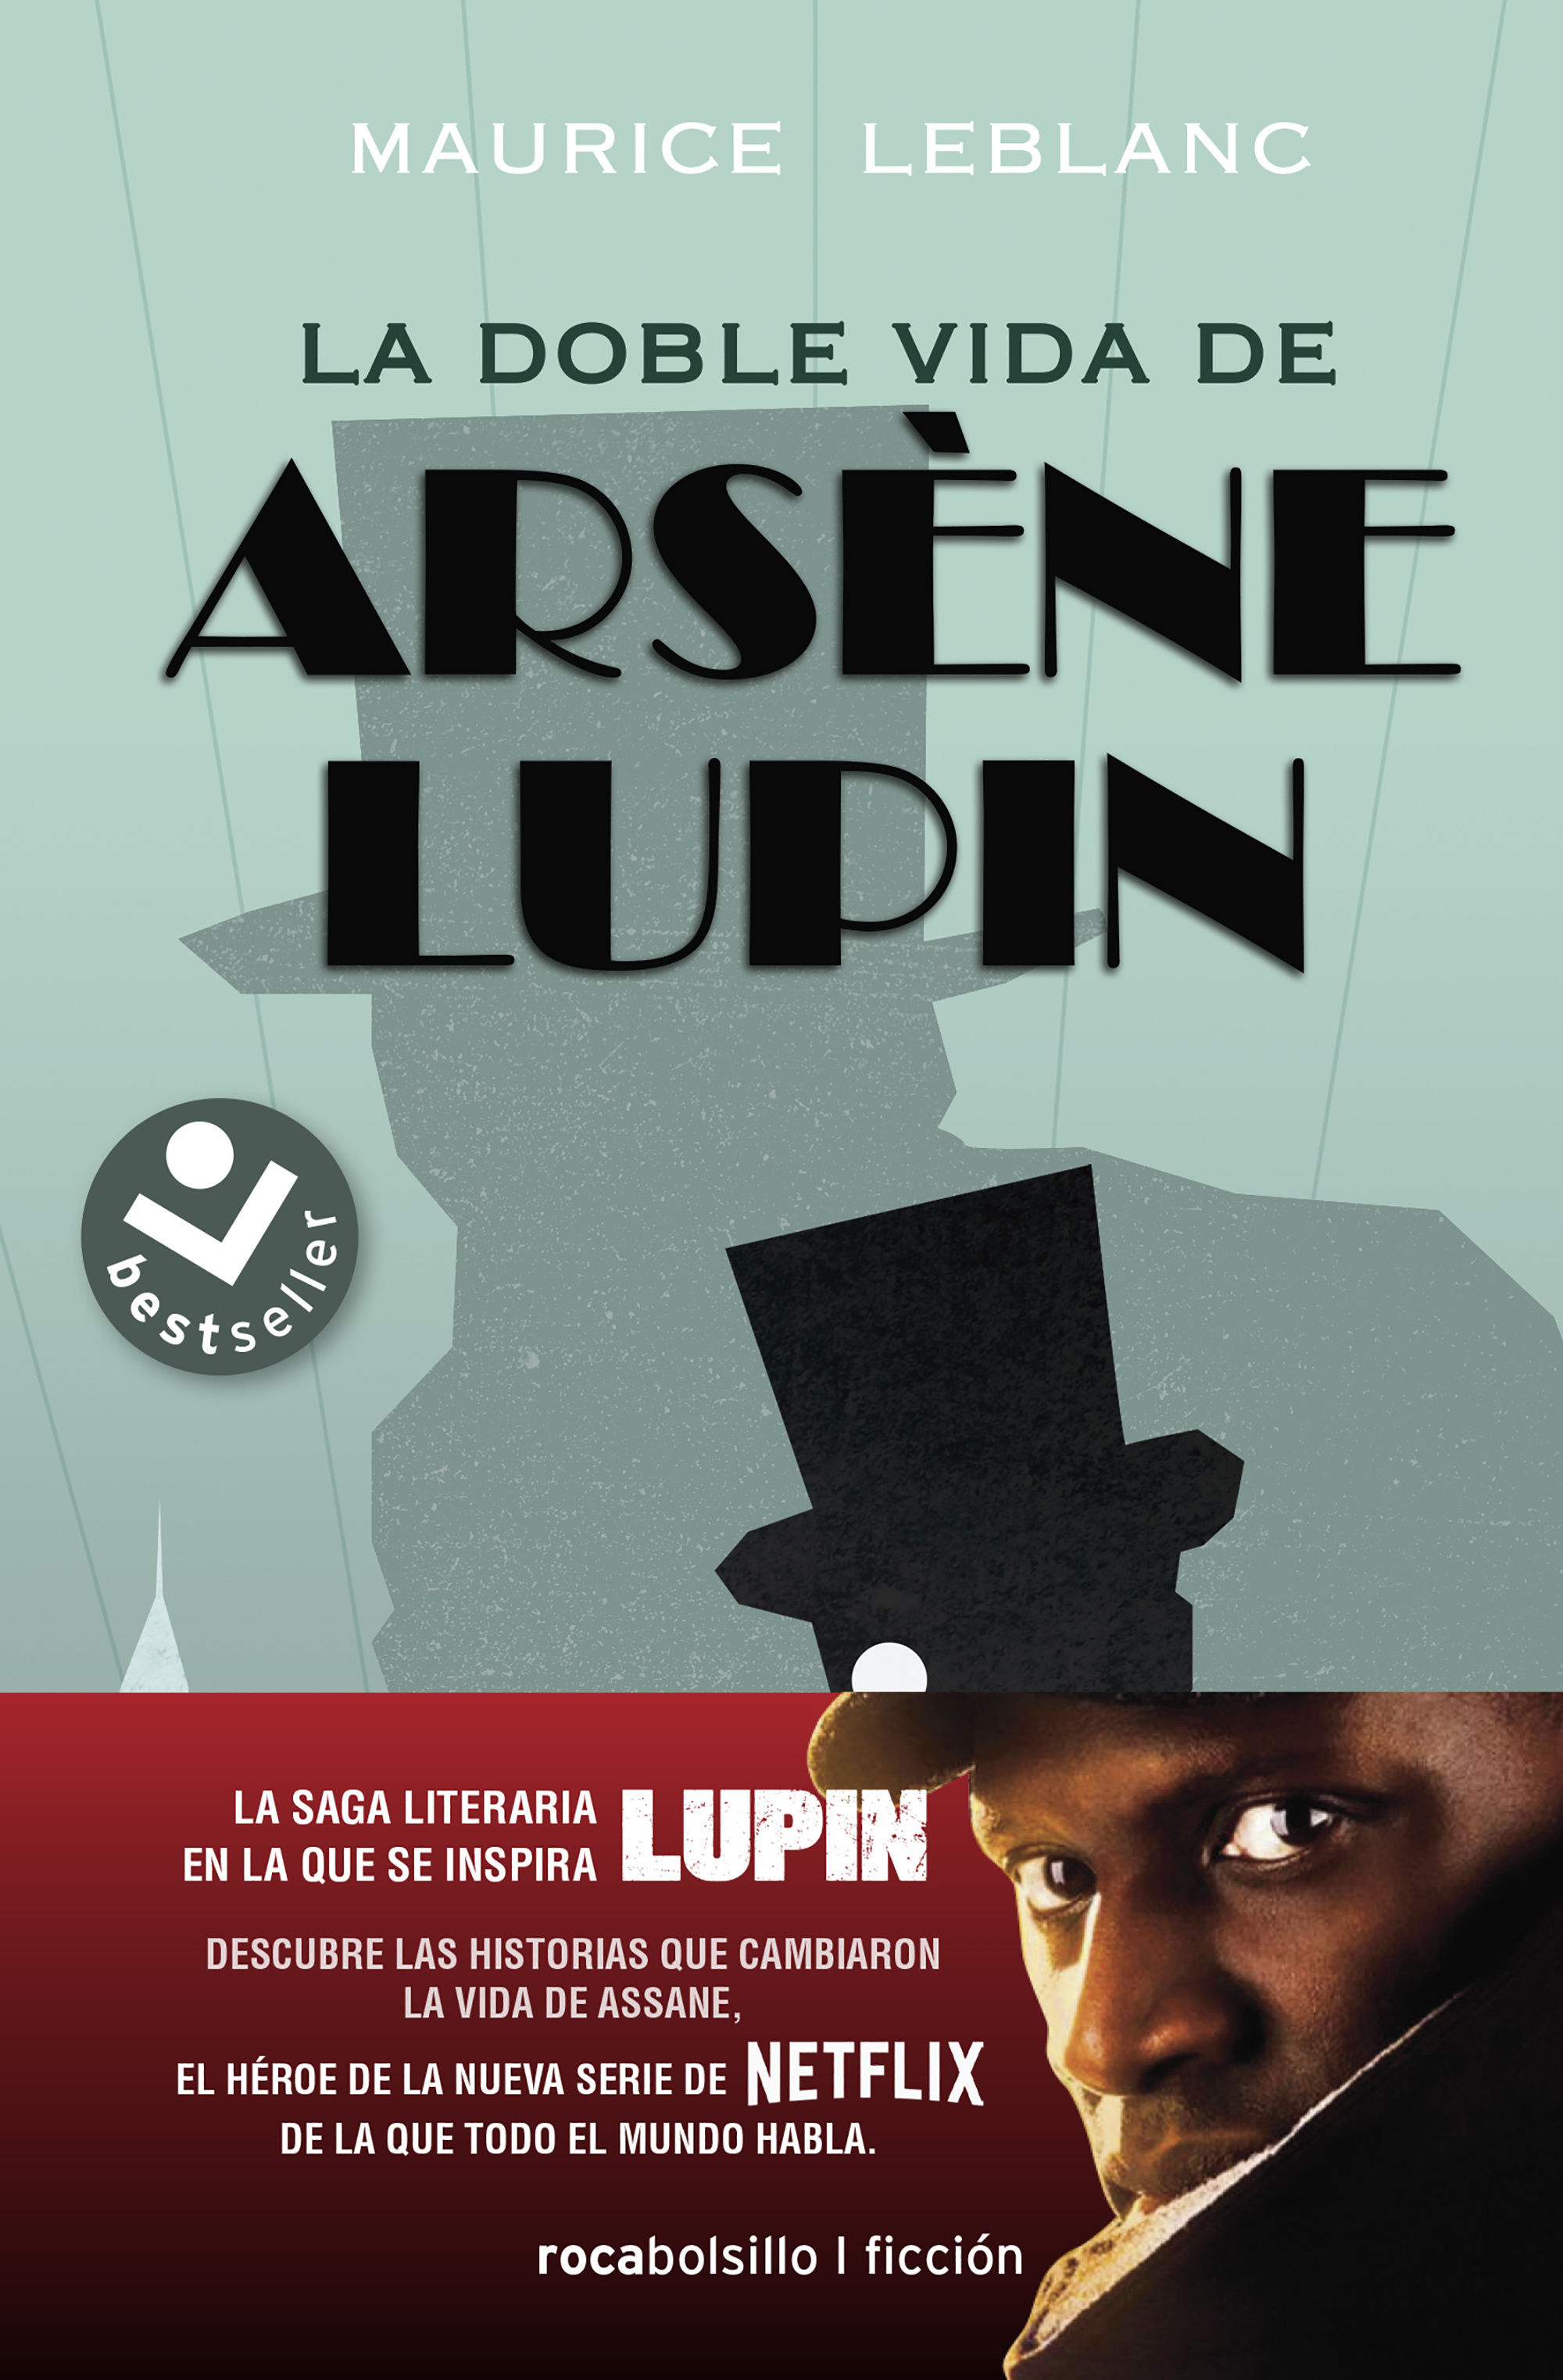 DOBLE VIDA DE ARSENE LUPIN